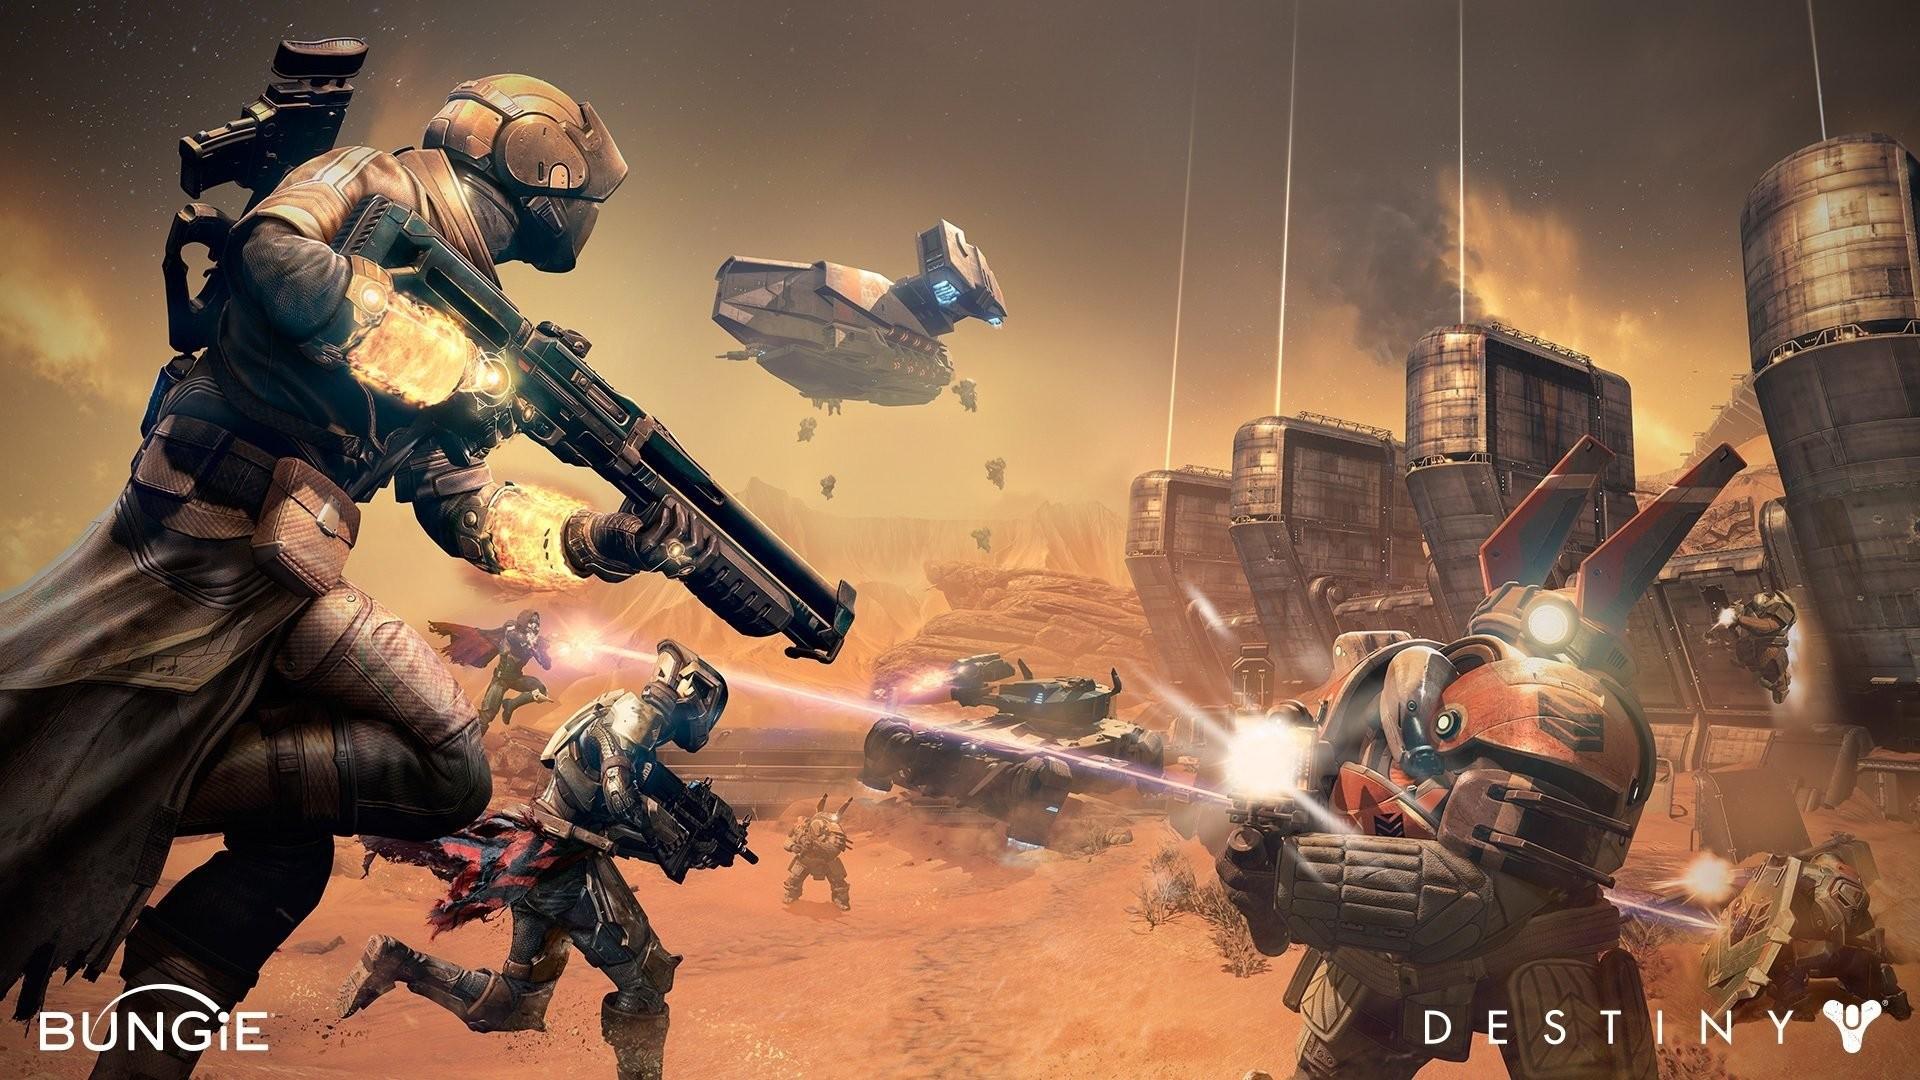 destiny video games wallpaper - photo #11